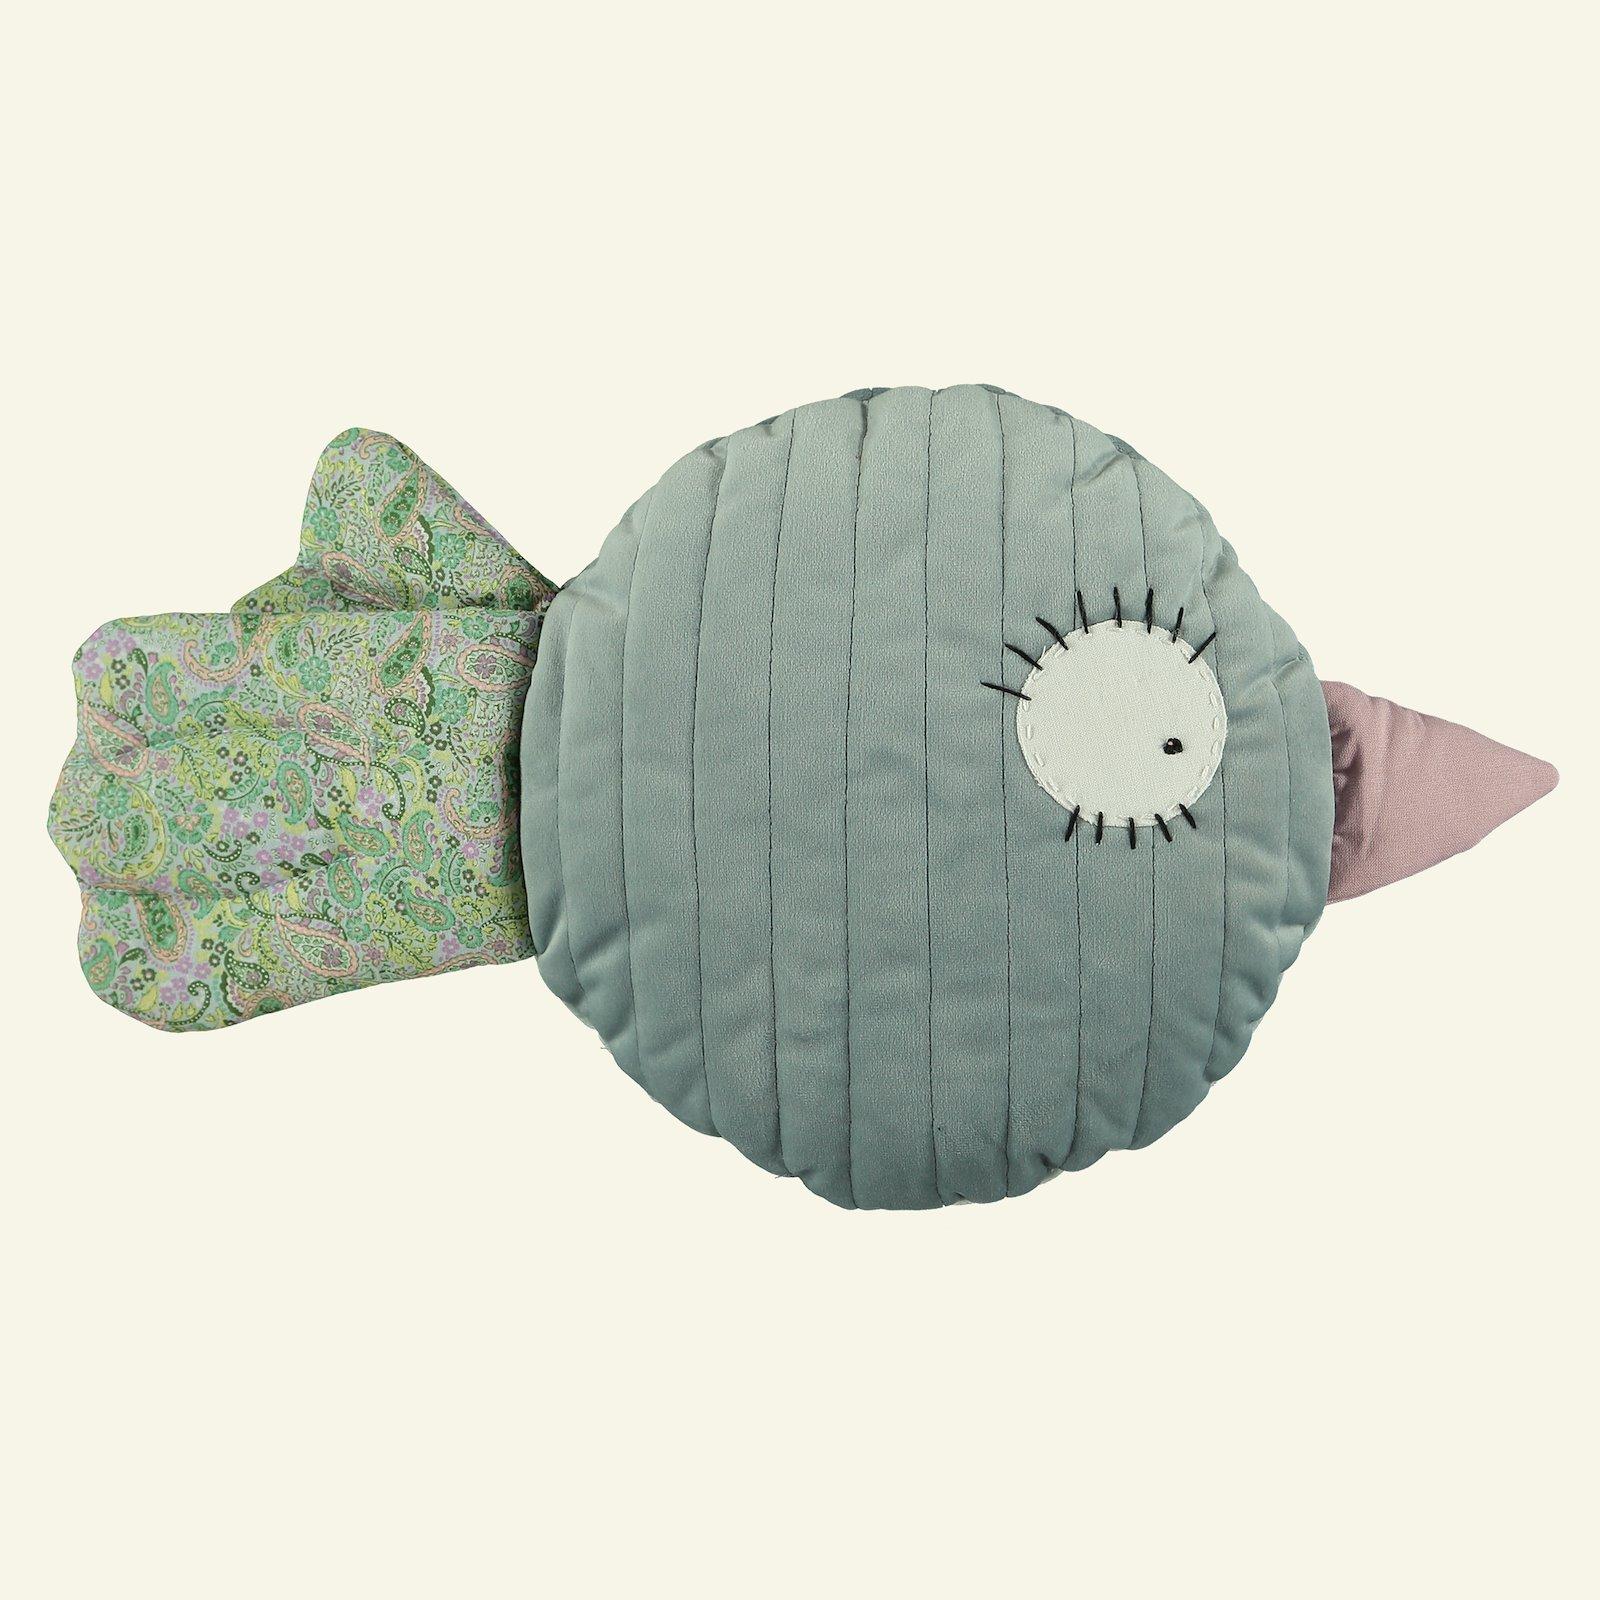 Bird/fish large and small p90338_824042_852367_4359_sskit